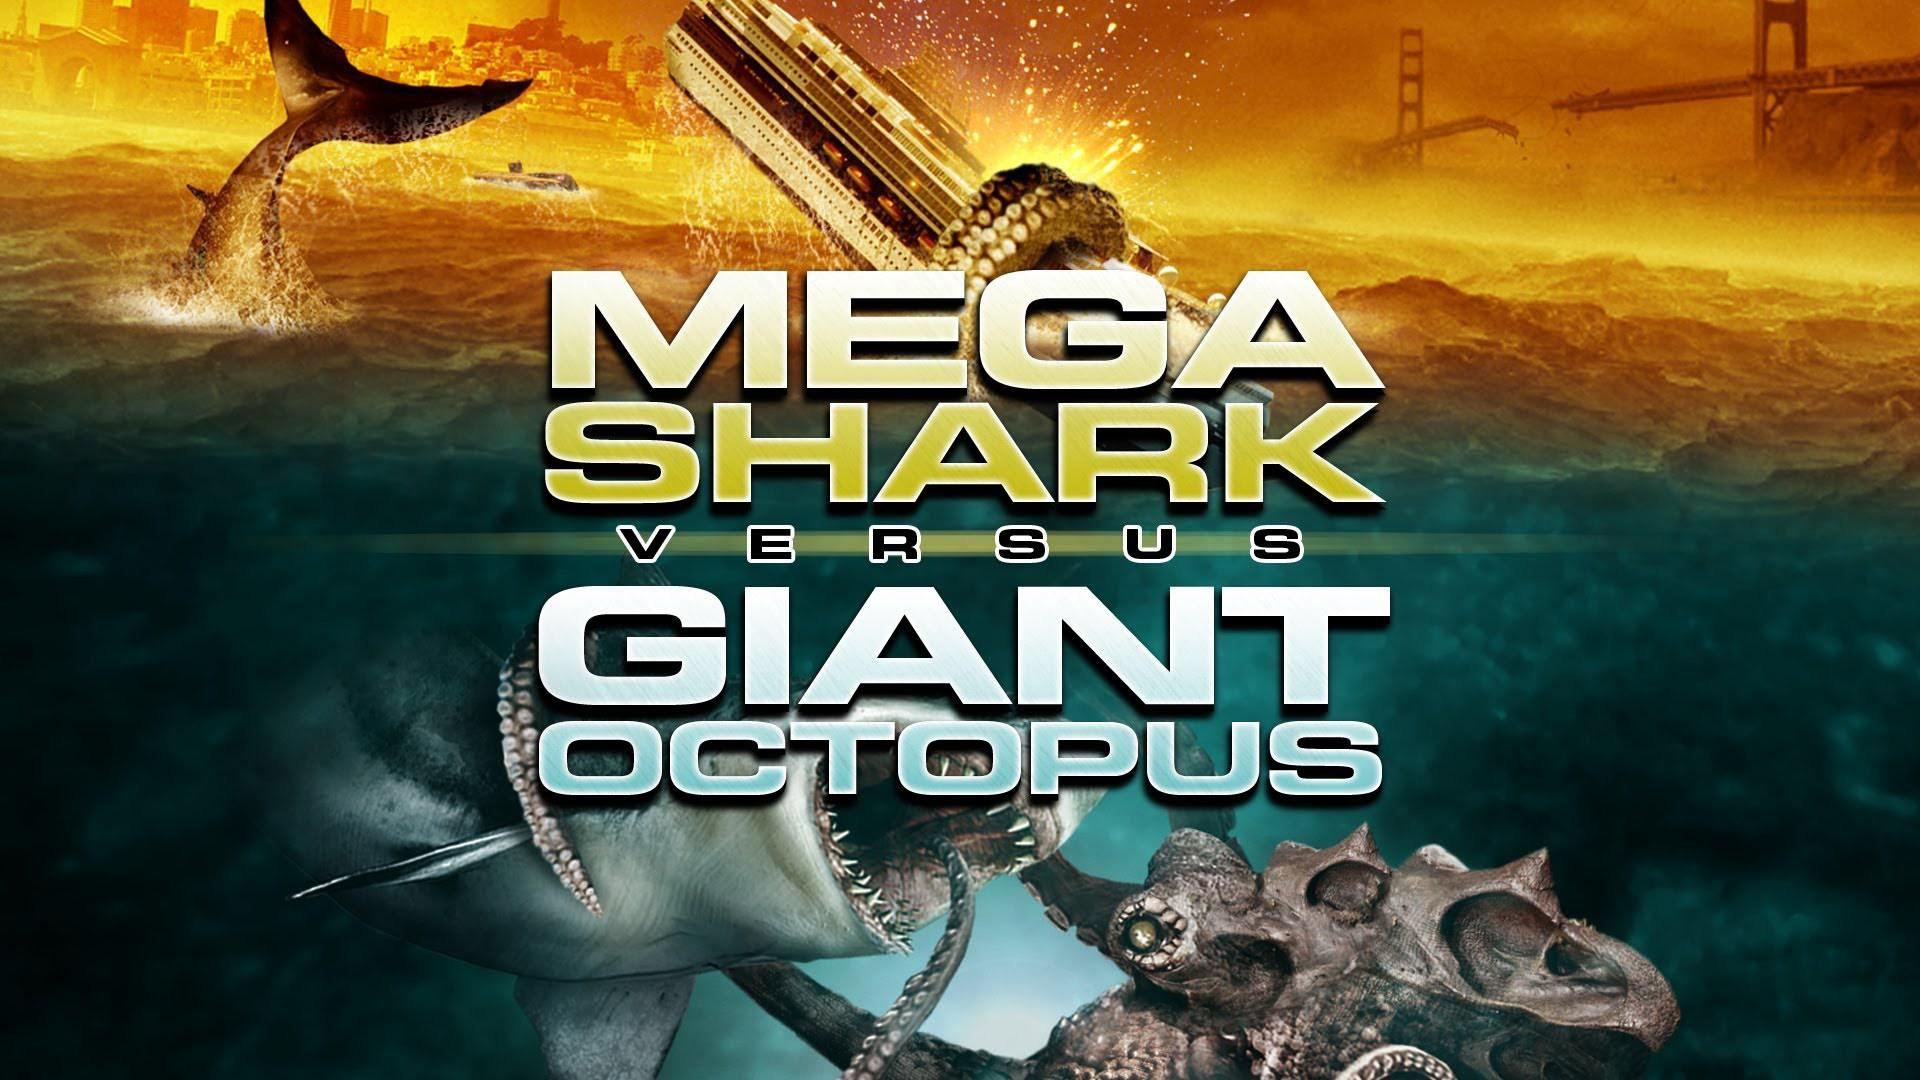 ocean_megashark_vs_giant_octopus_csokiduda.jpg